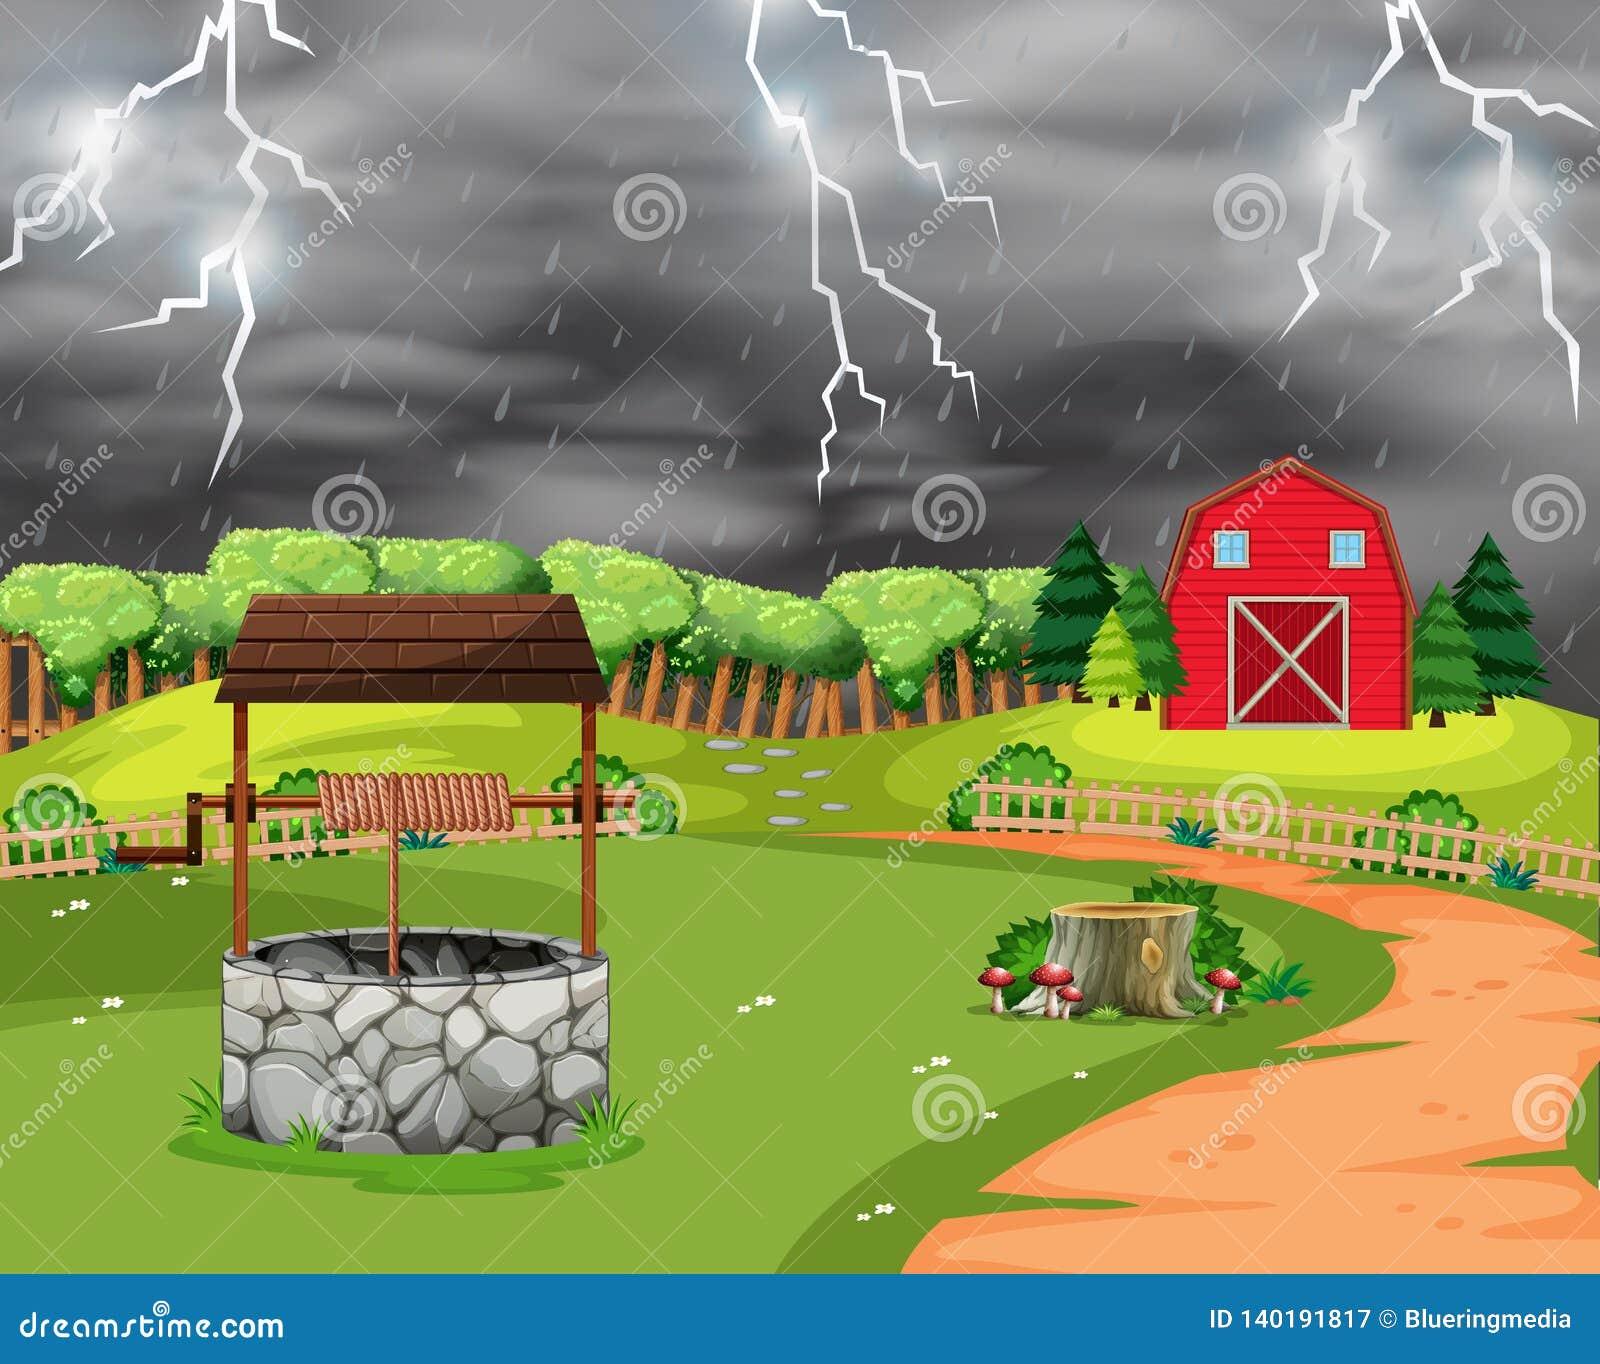 Lightning storm landscape scene